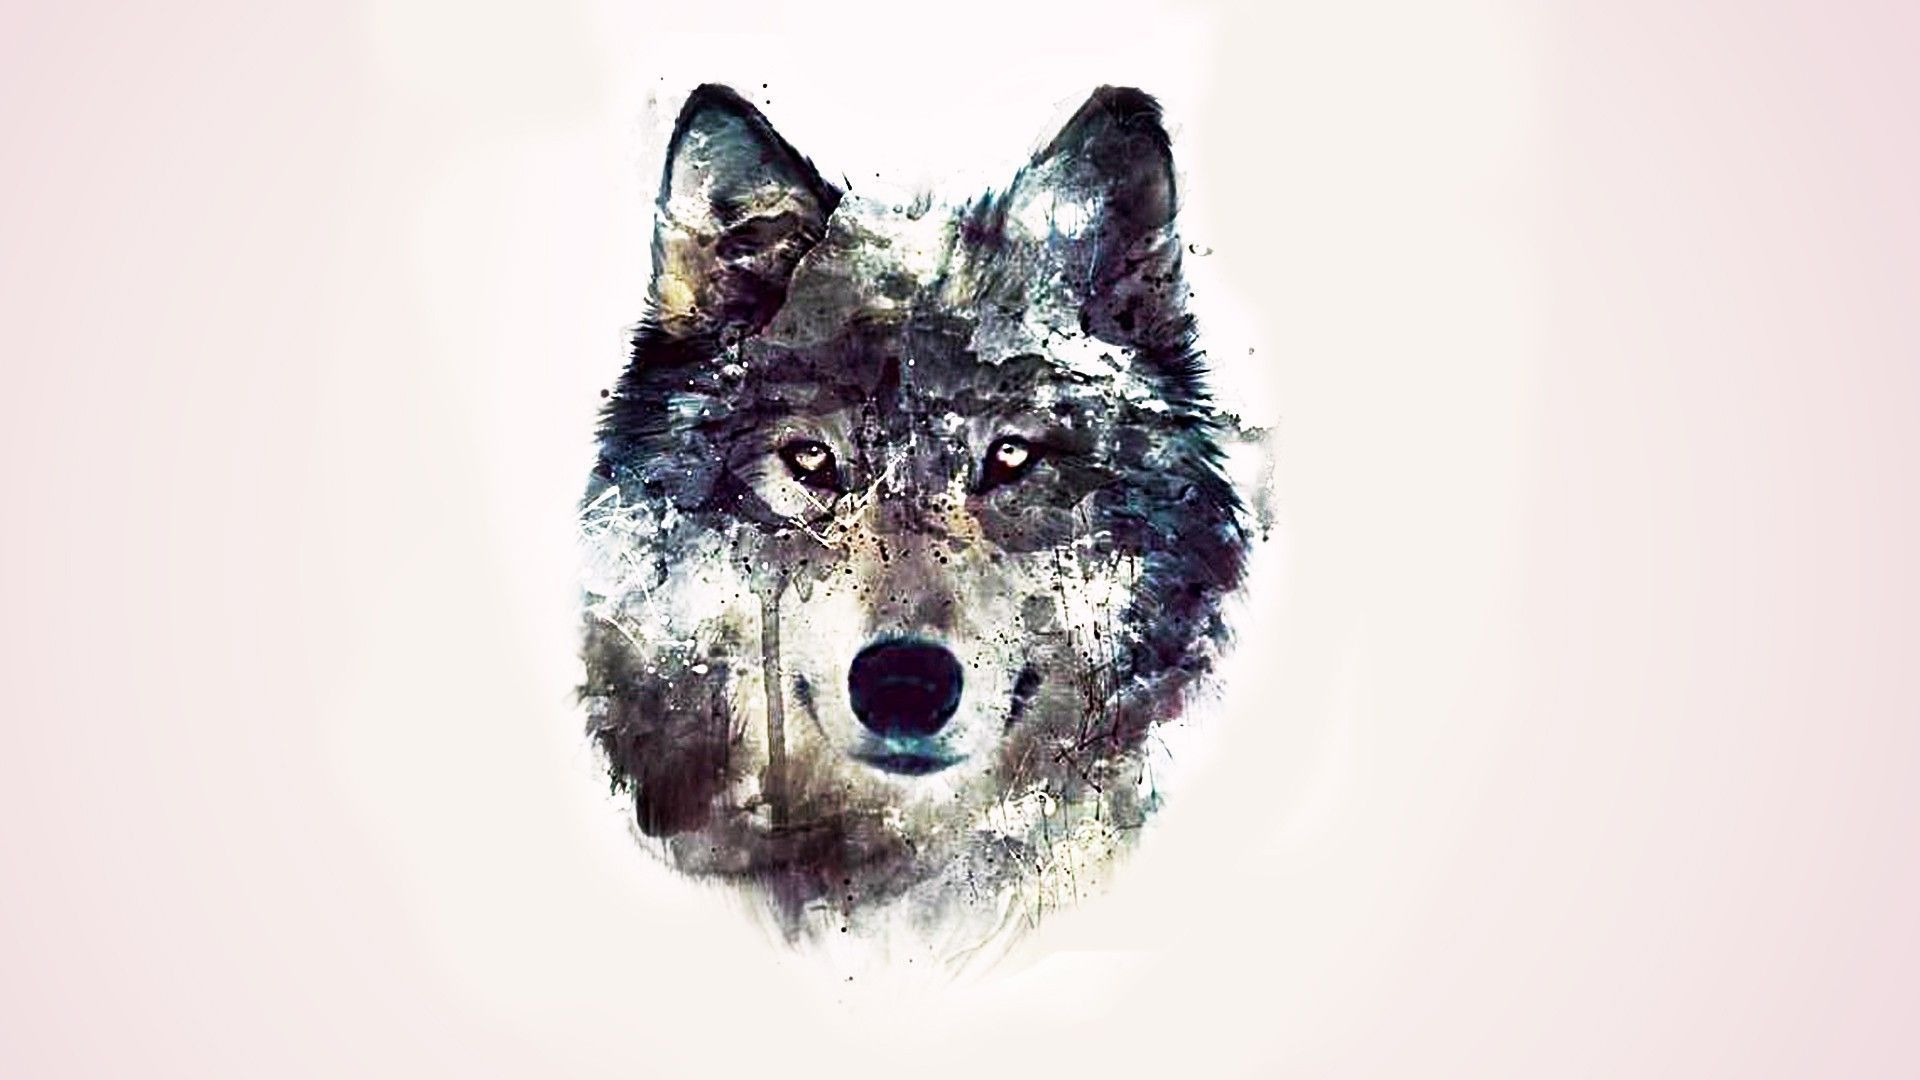 pin wallpaper cool wolf - photo #48